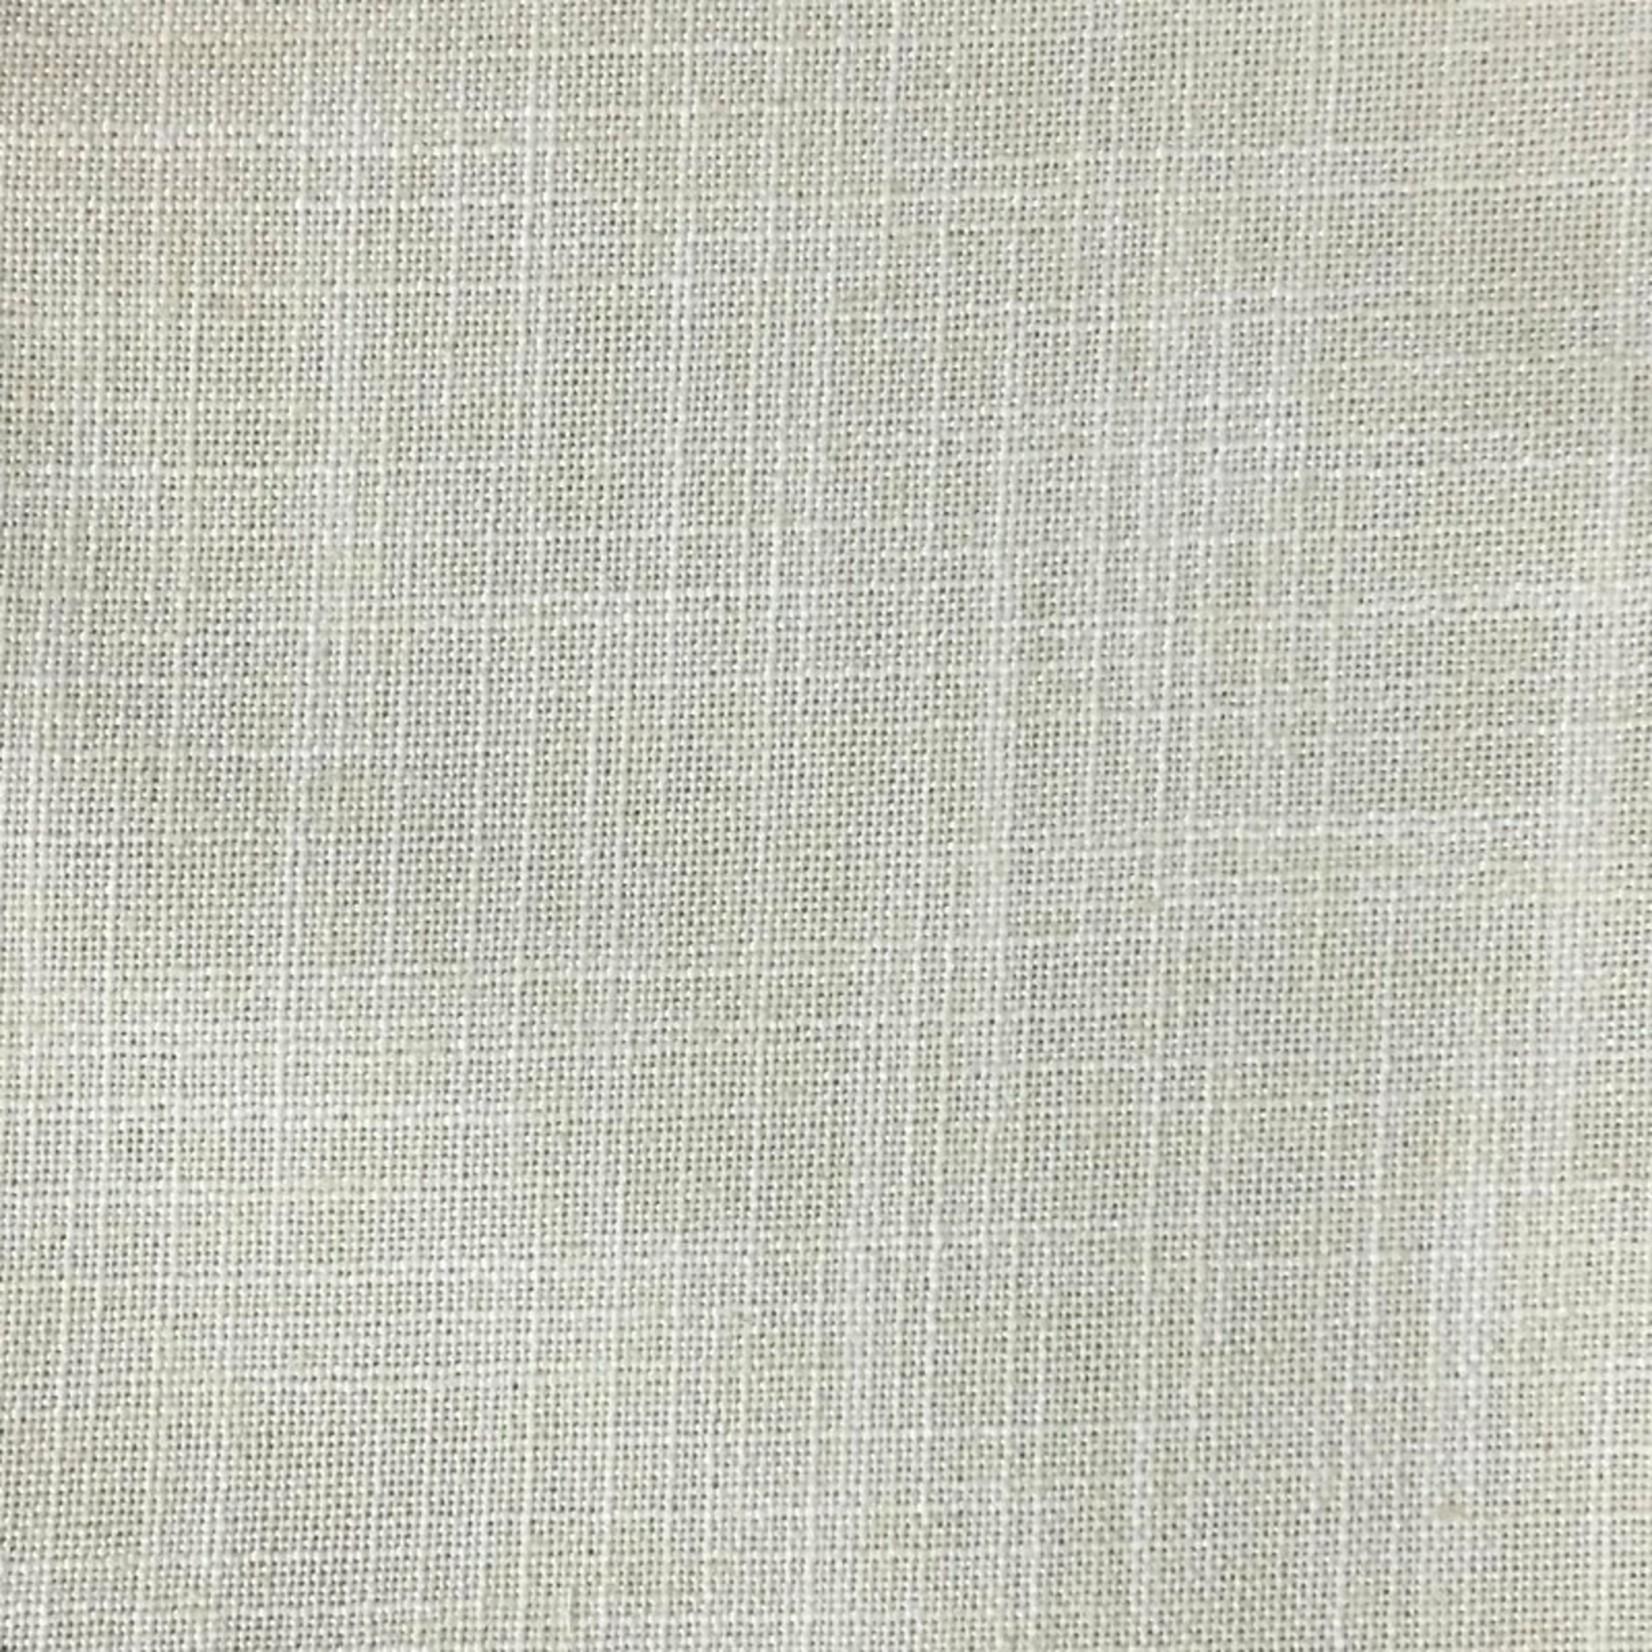 *Blake Fabric - Vanilla - 4 Yards - Final Sale